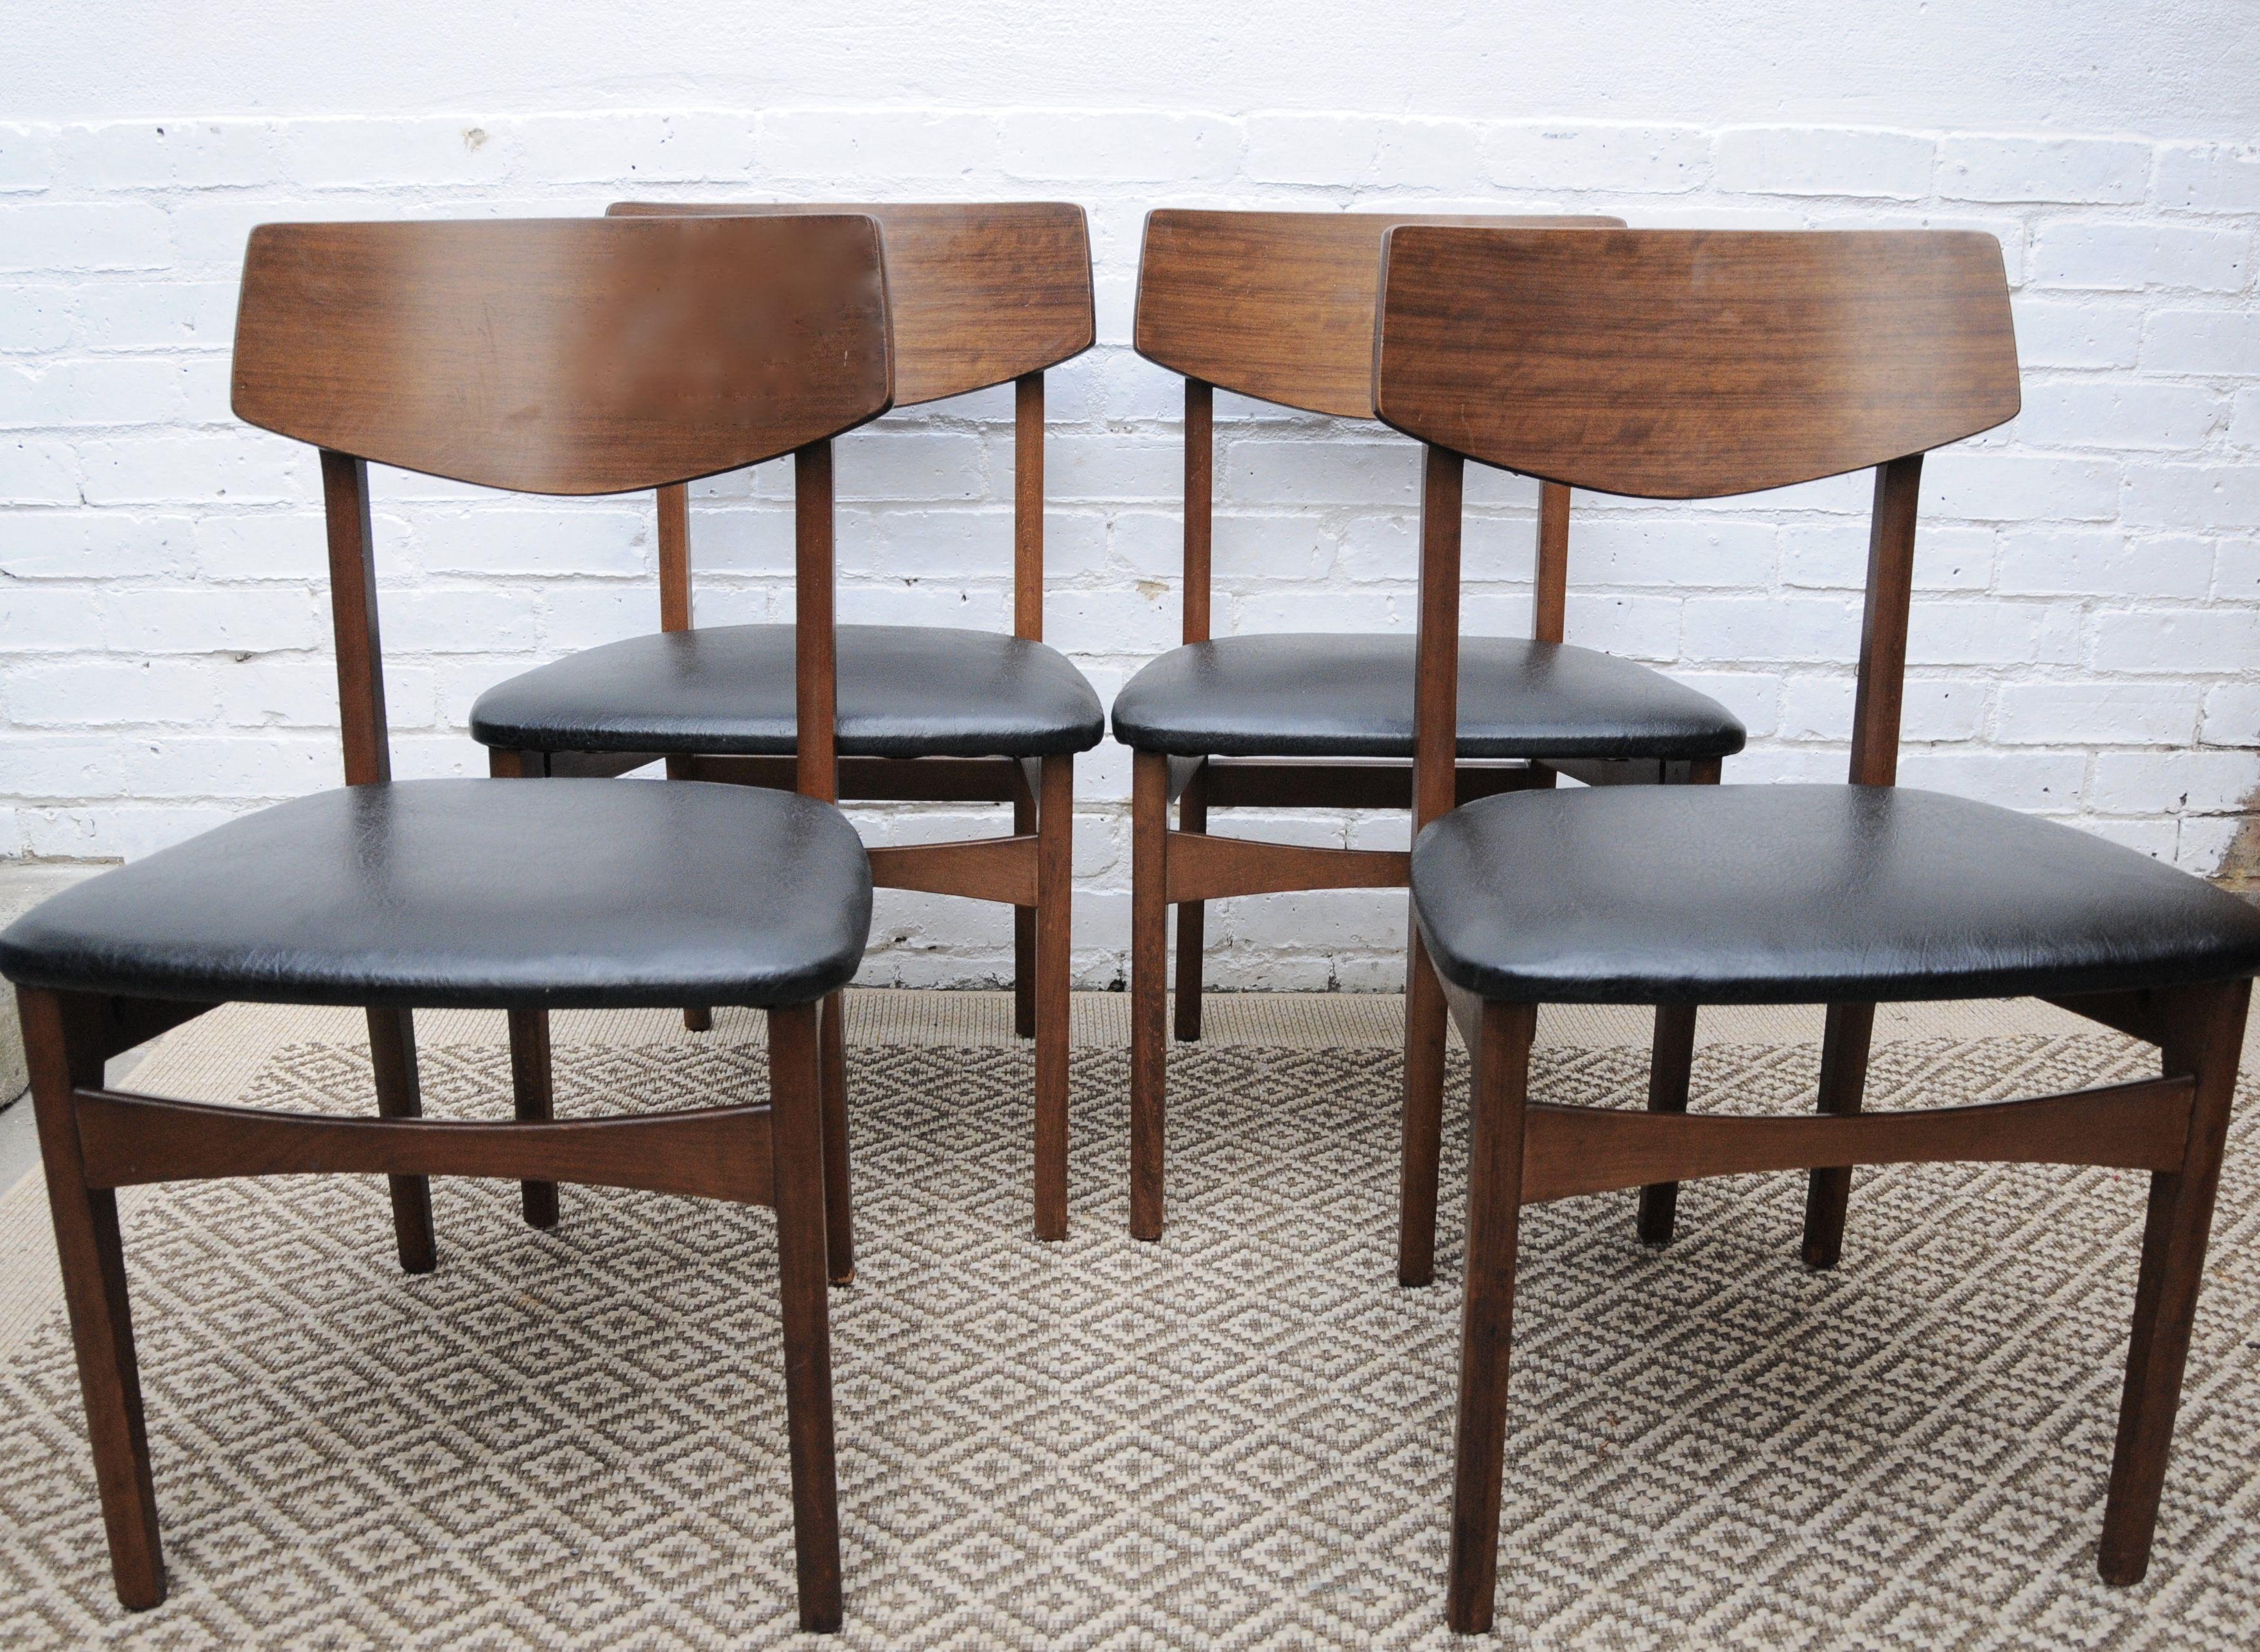 Fantastic Retro Dining Chairs Black Vinyl Seat Dbd Dining Chairs Creativecarmelina Interior Chair Design Creativecarmelinacom